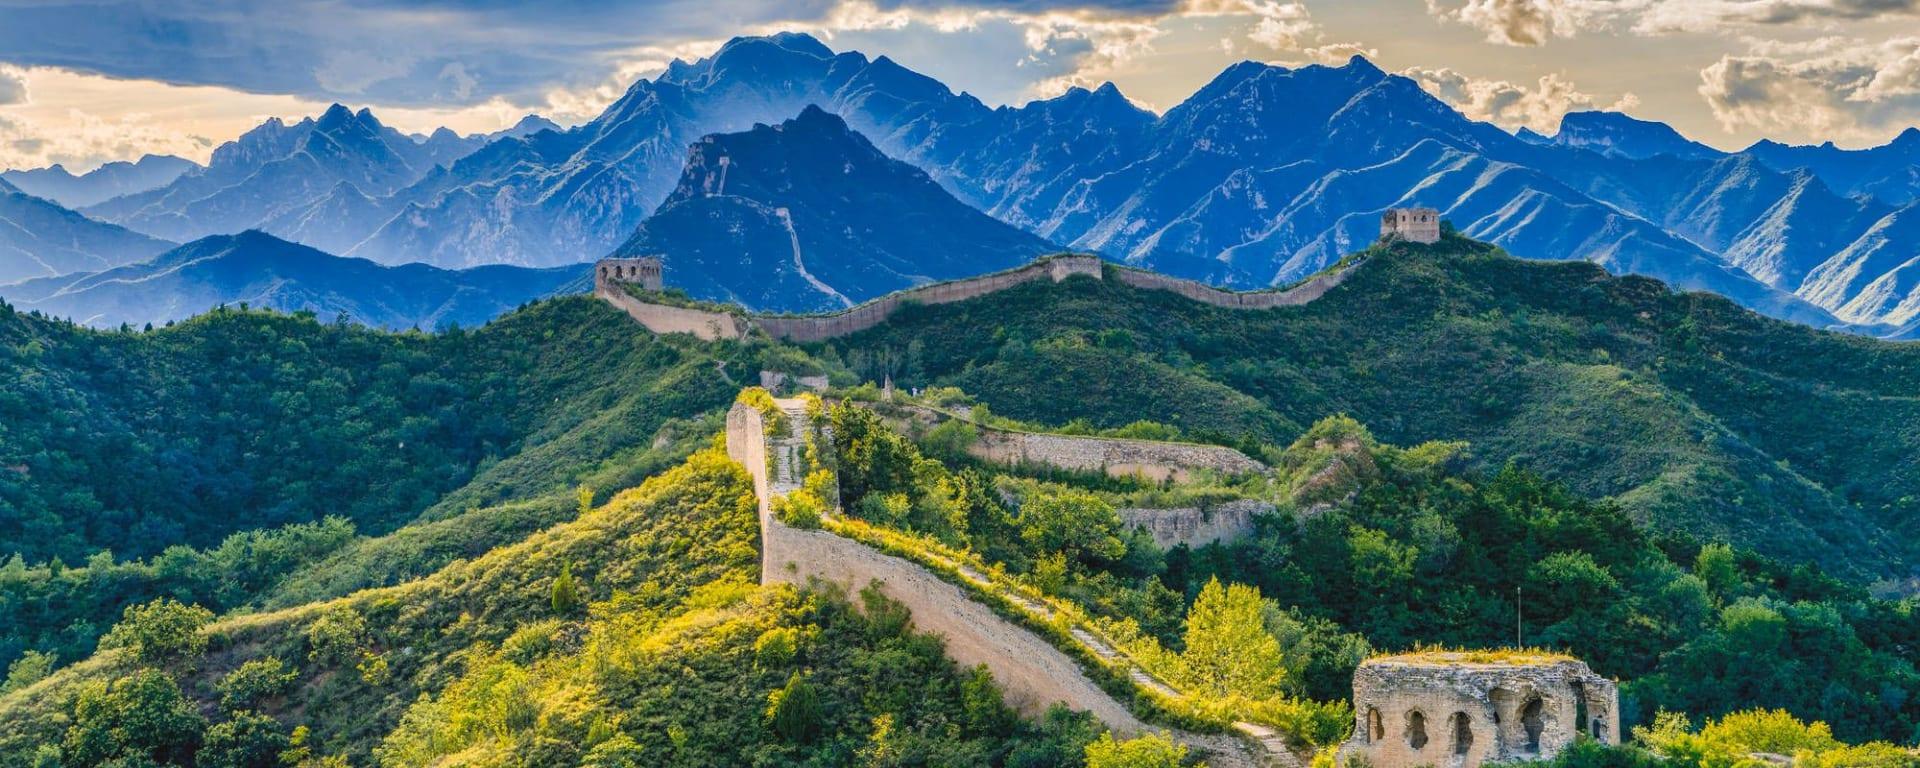 Les hauts lieux de la Chine de Pékin: Great Wall Jinshanling to Gubeikou